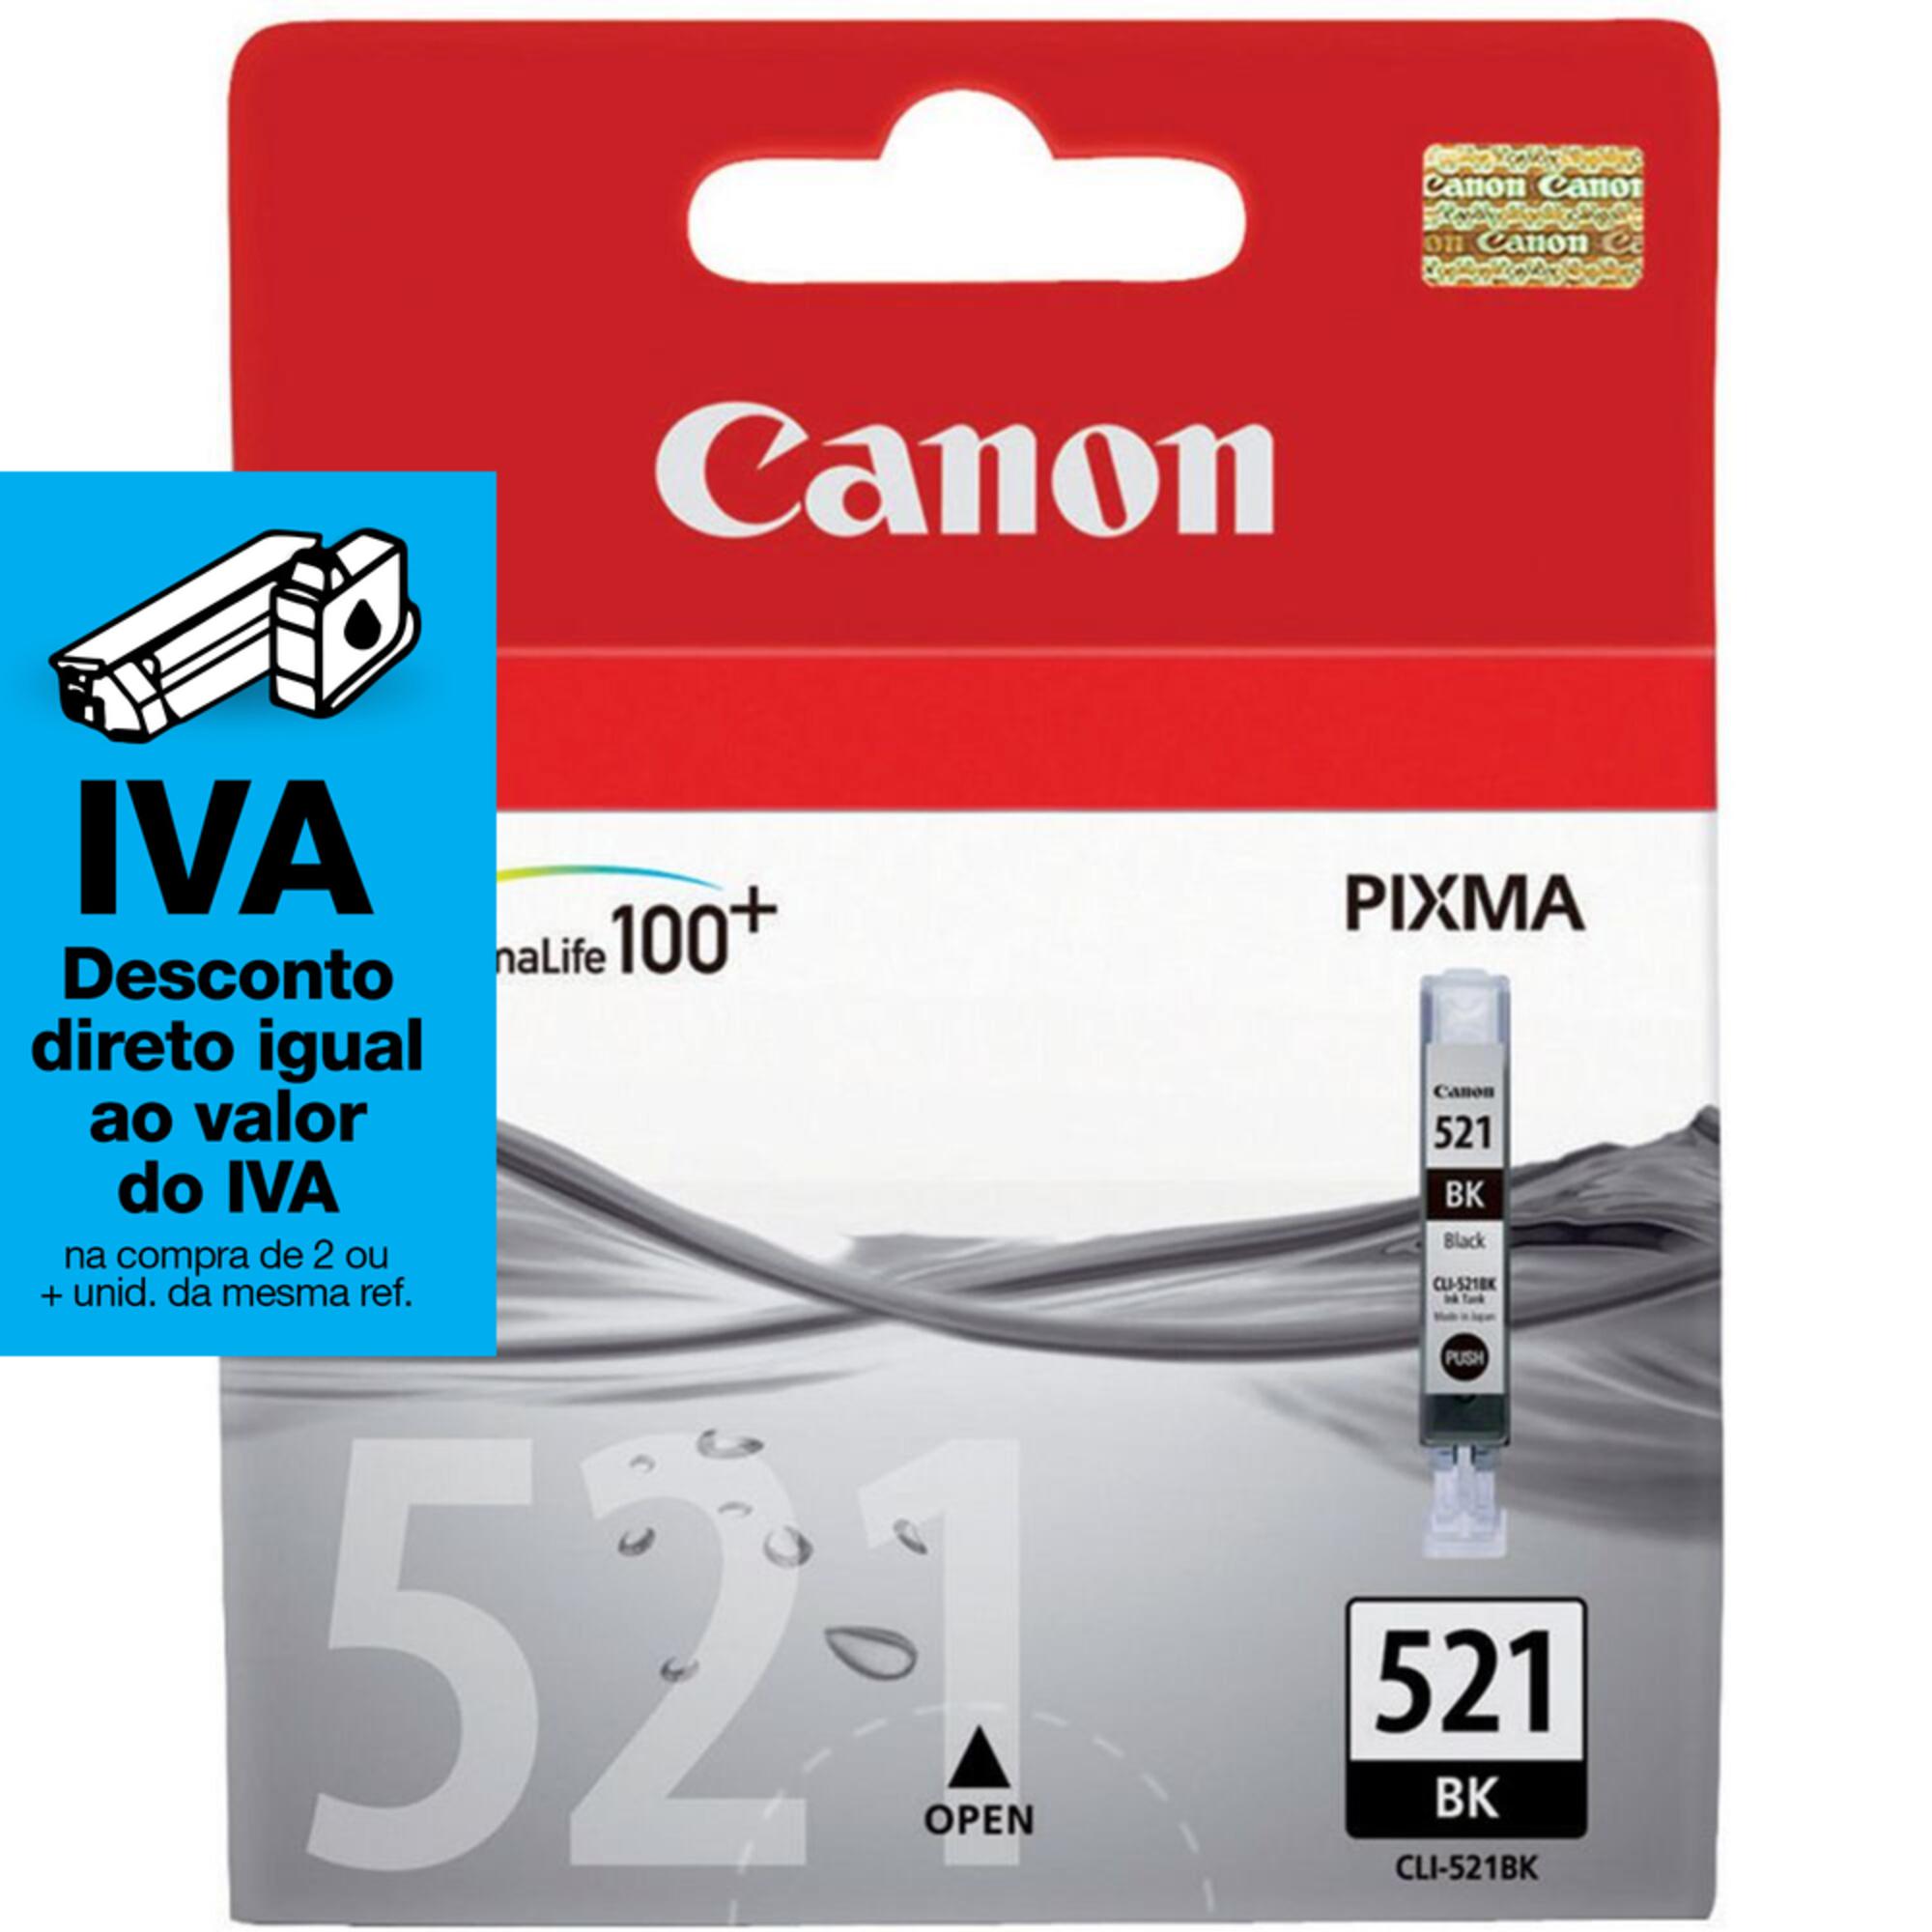 Canon Tinteiro Original CLI-521 BK com Tinta ChromaLife 100+, Preto, Individual, 2933B008